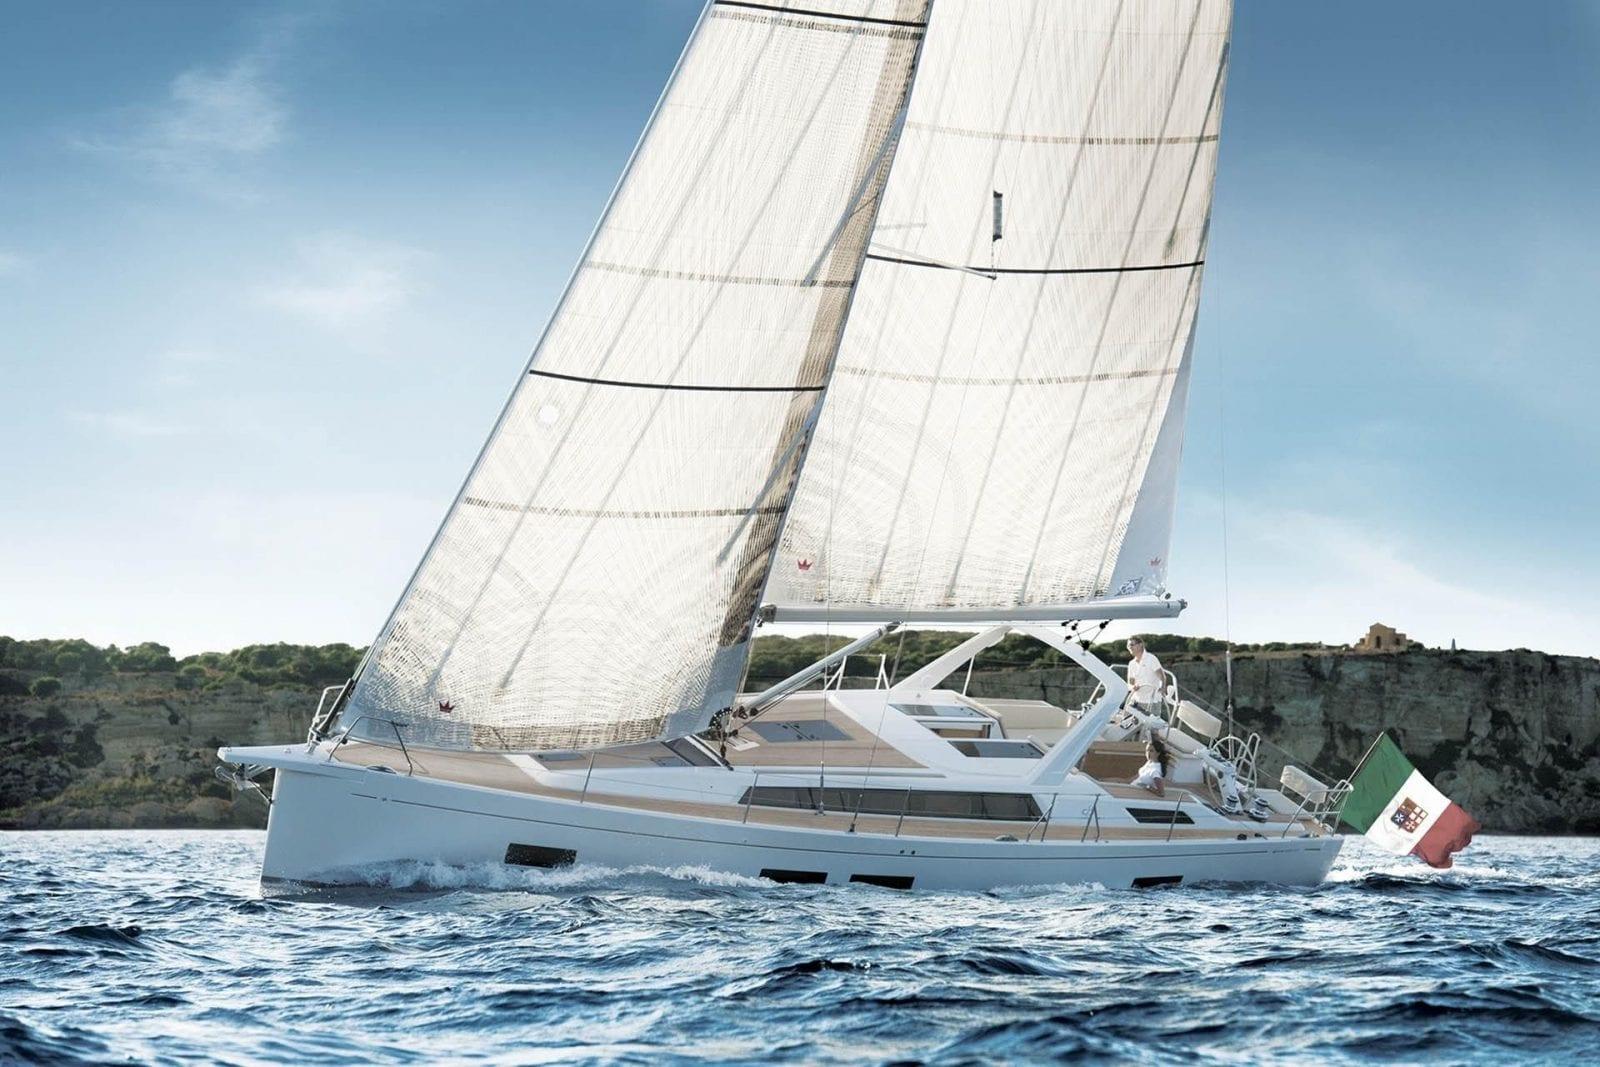 6226308 20170505122517945 1 XLARGE - Grand Soleil 46 Long Cruise